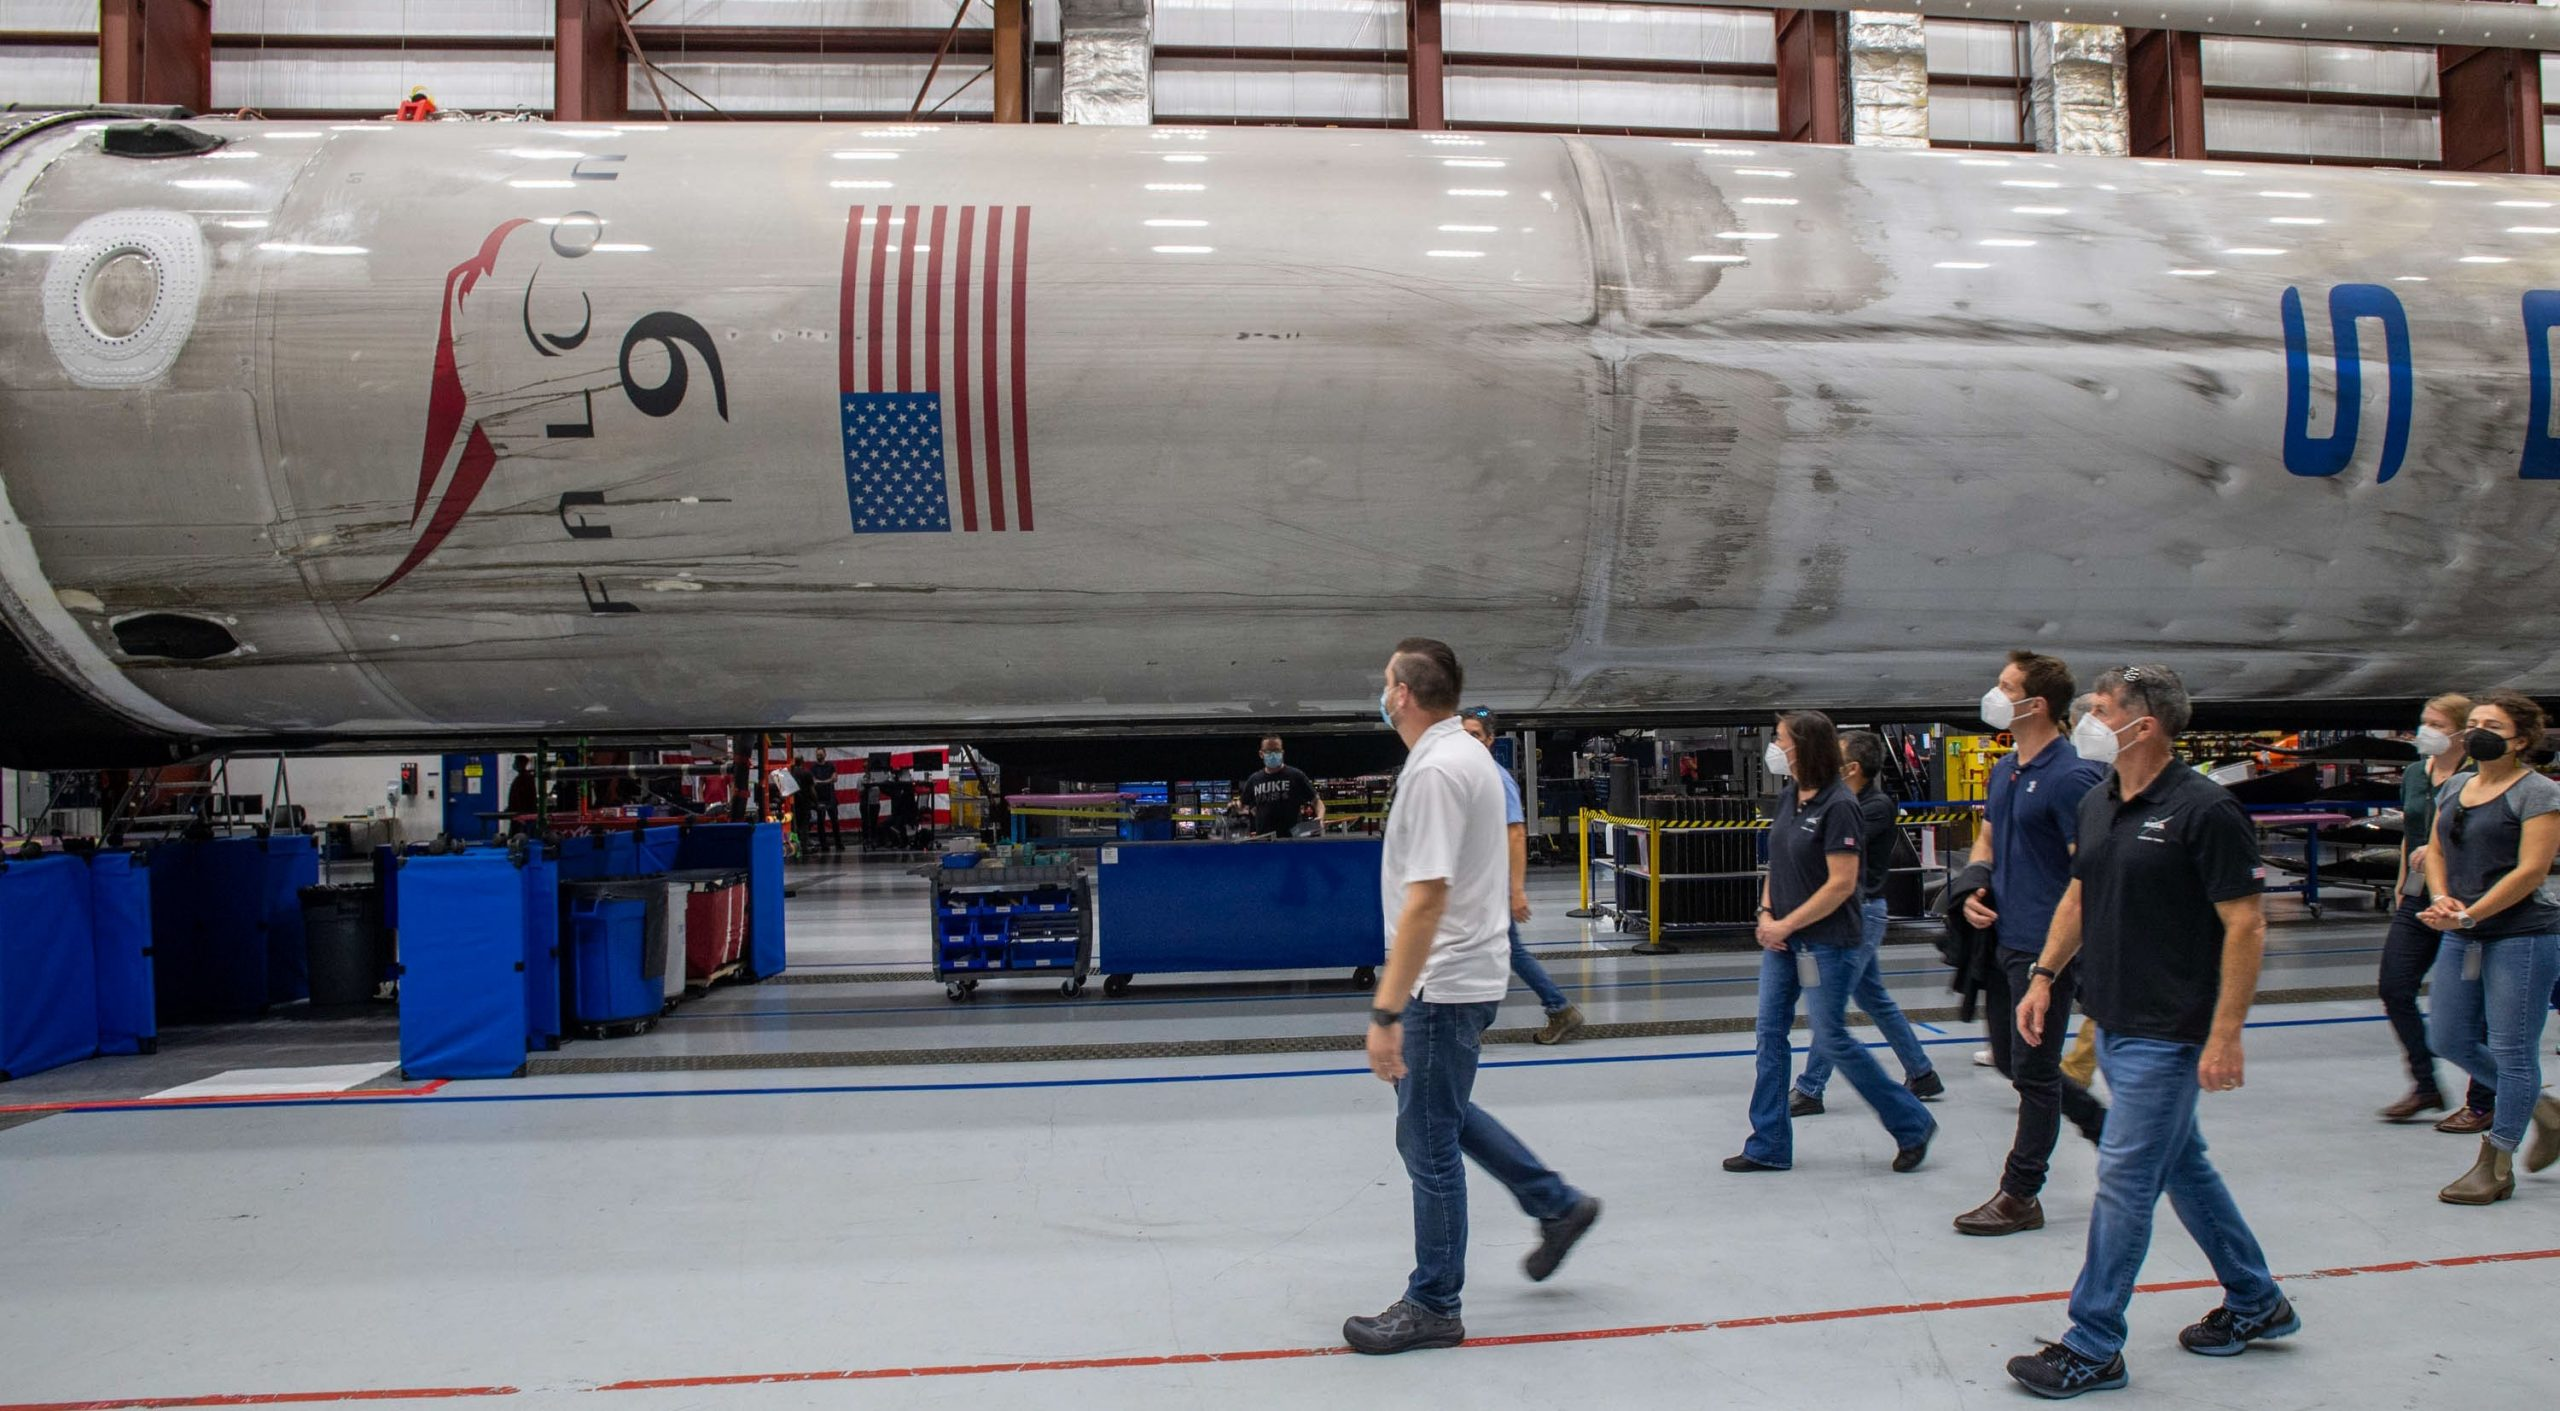 Crew-2 Falcon 9 B1061 39A hangar tour Pesquet Kimbrough Hoshide McArthur 2021 (SpaceX) 1 c